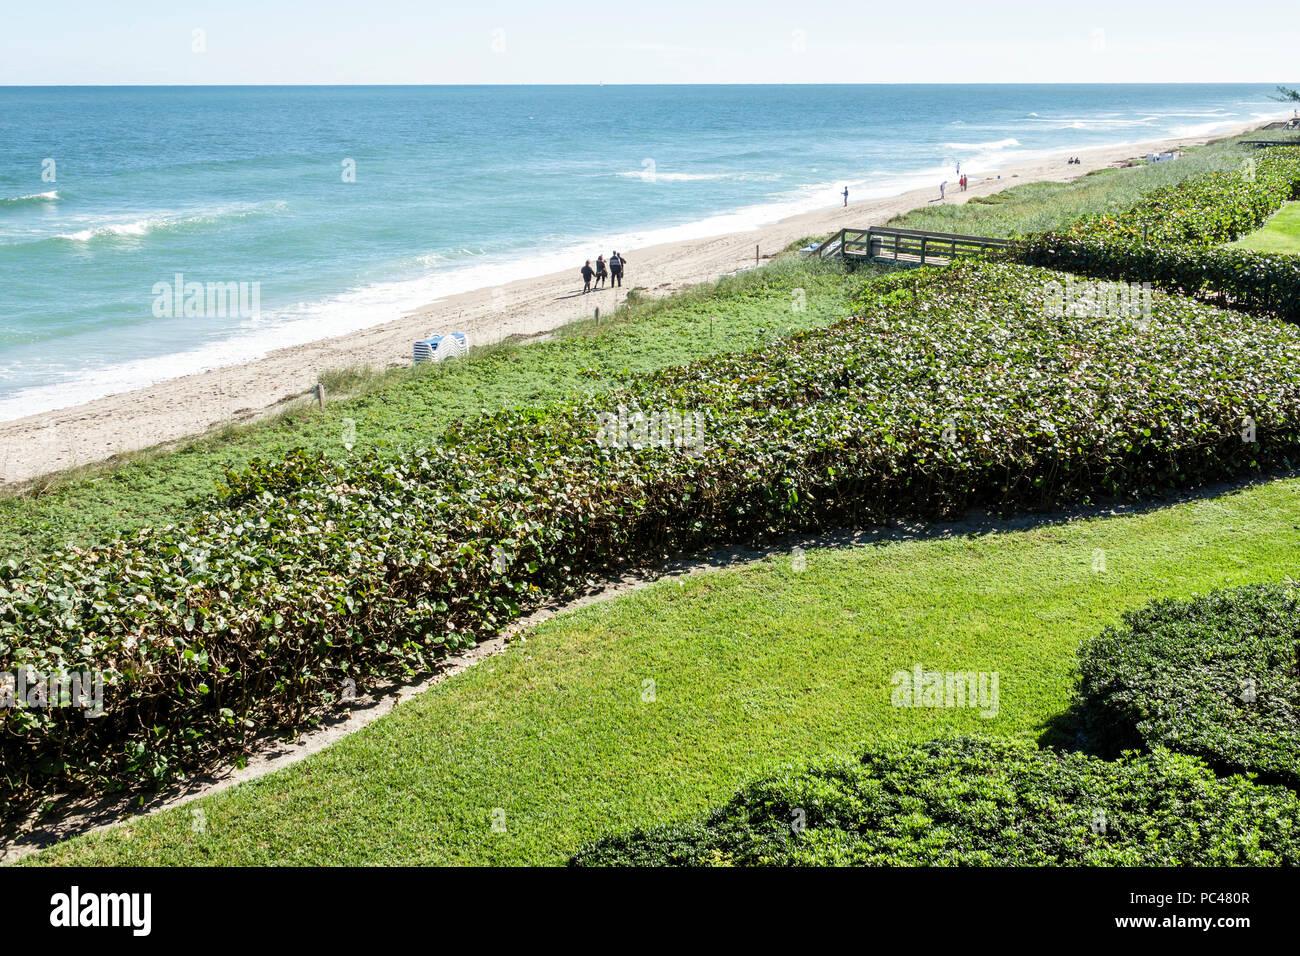 Florida Jensen Beach Hutchinson Island Starwood Vistana Beach Club Atlantic Ocean surf sand water - Stock Image